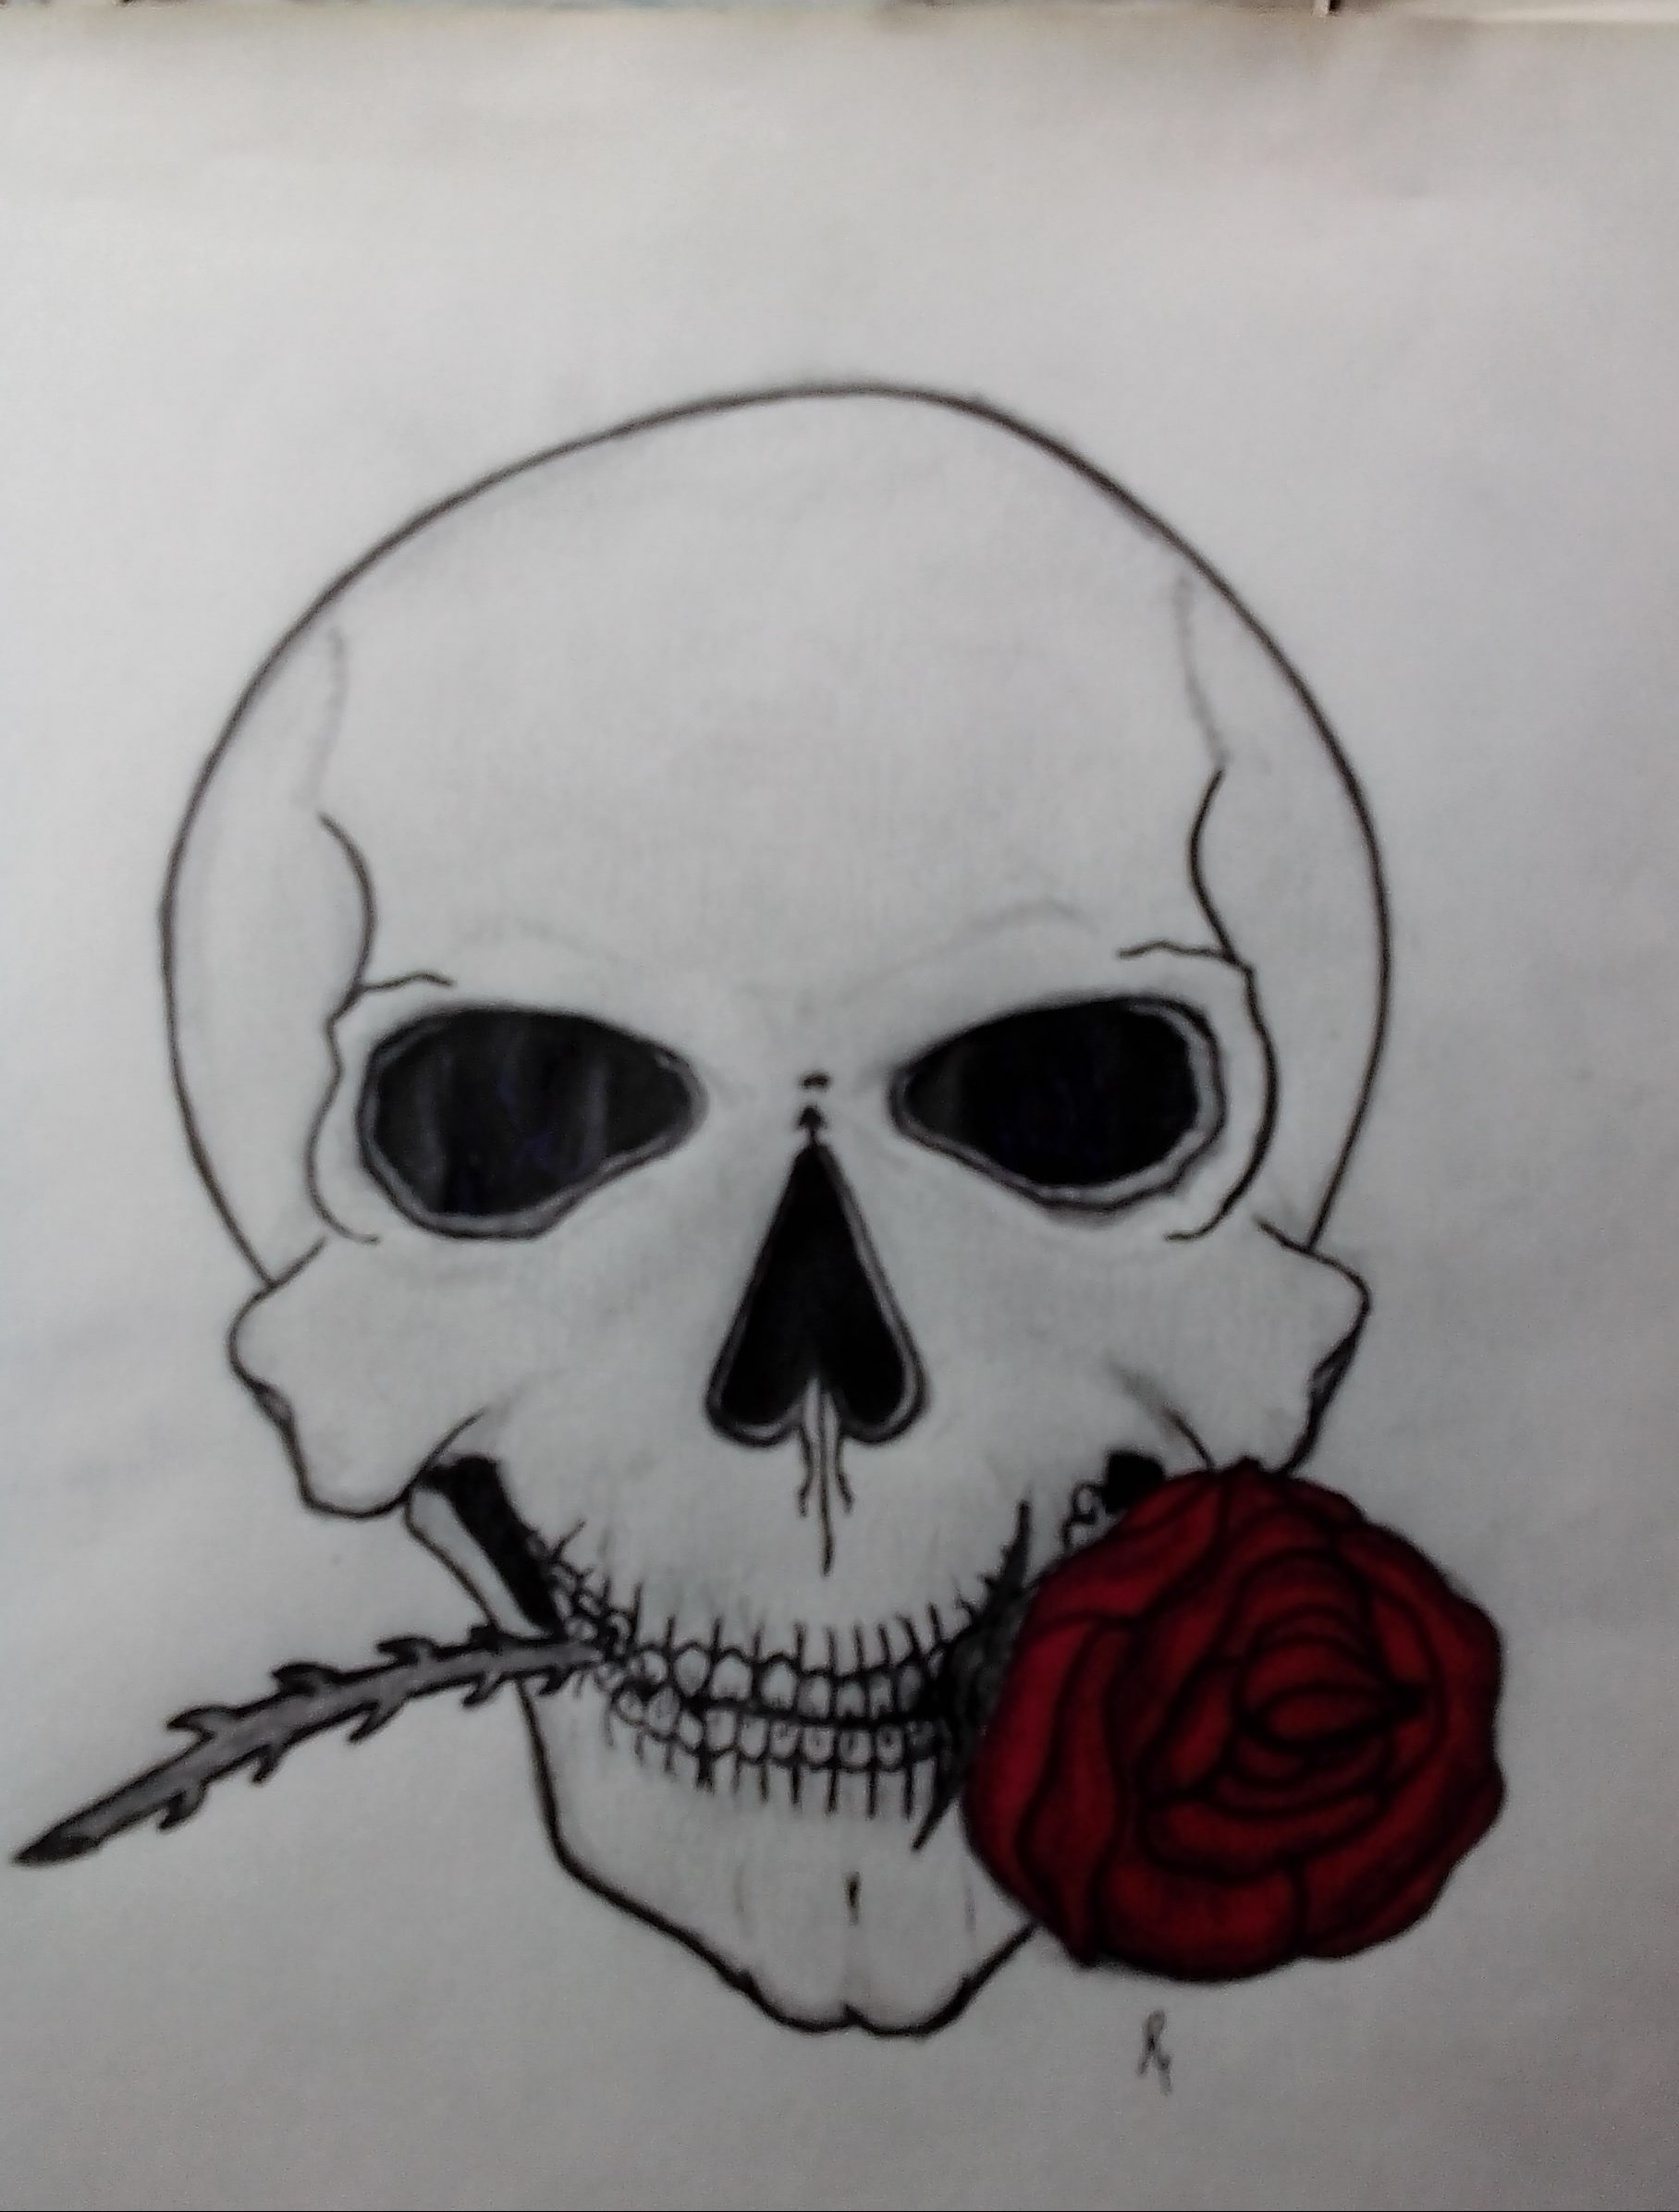 another tattoo design by smokeybandit1